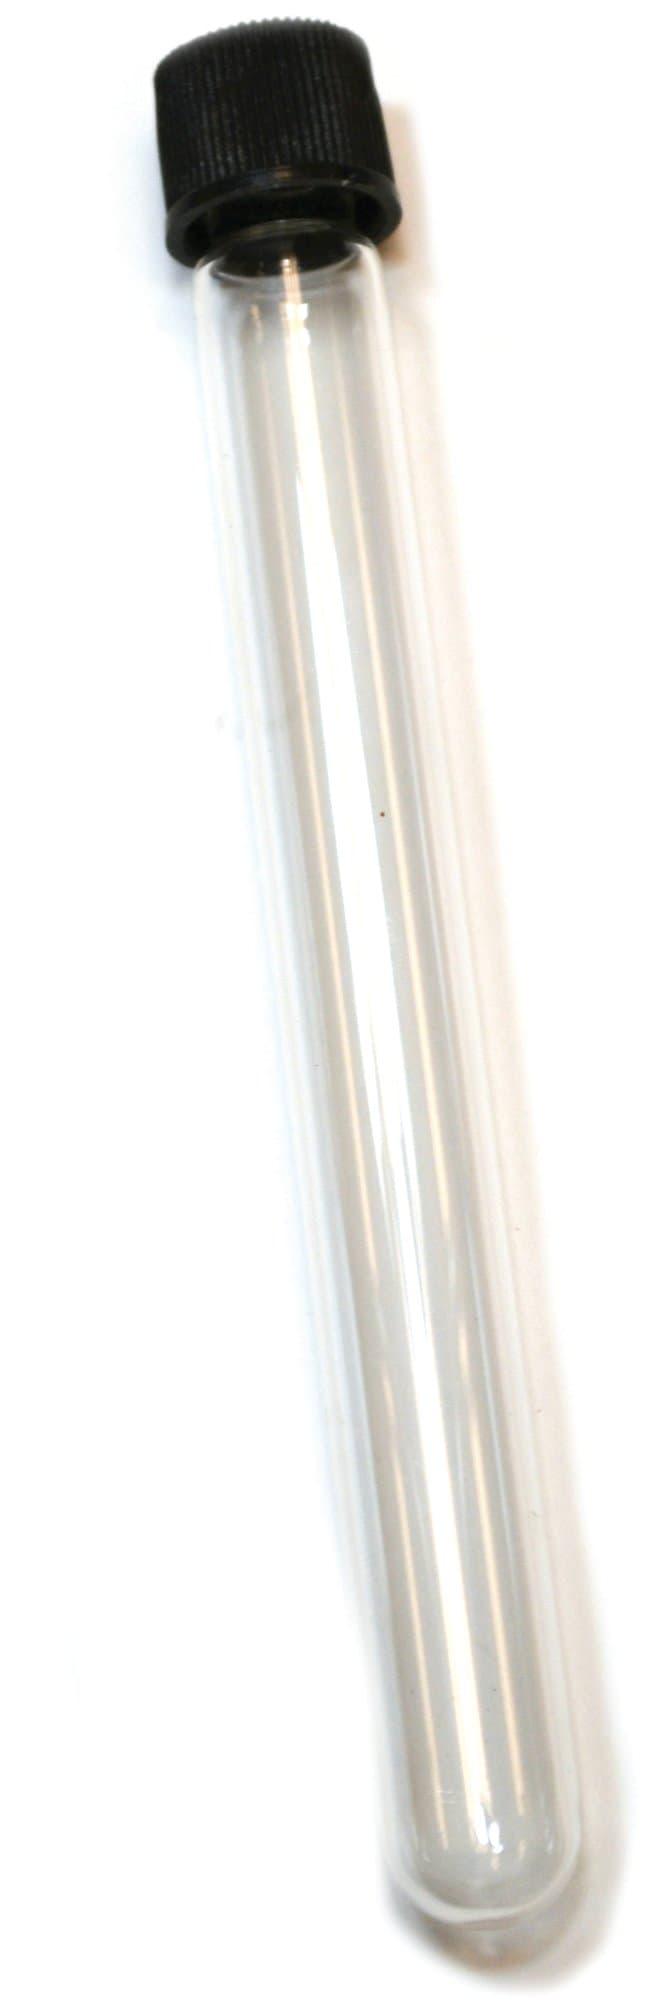 Eisco™Glass Test Tube with Screw Cap